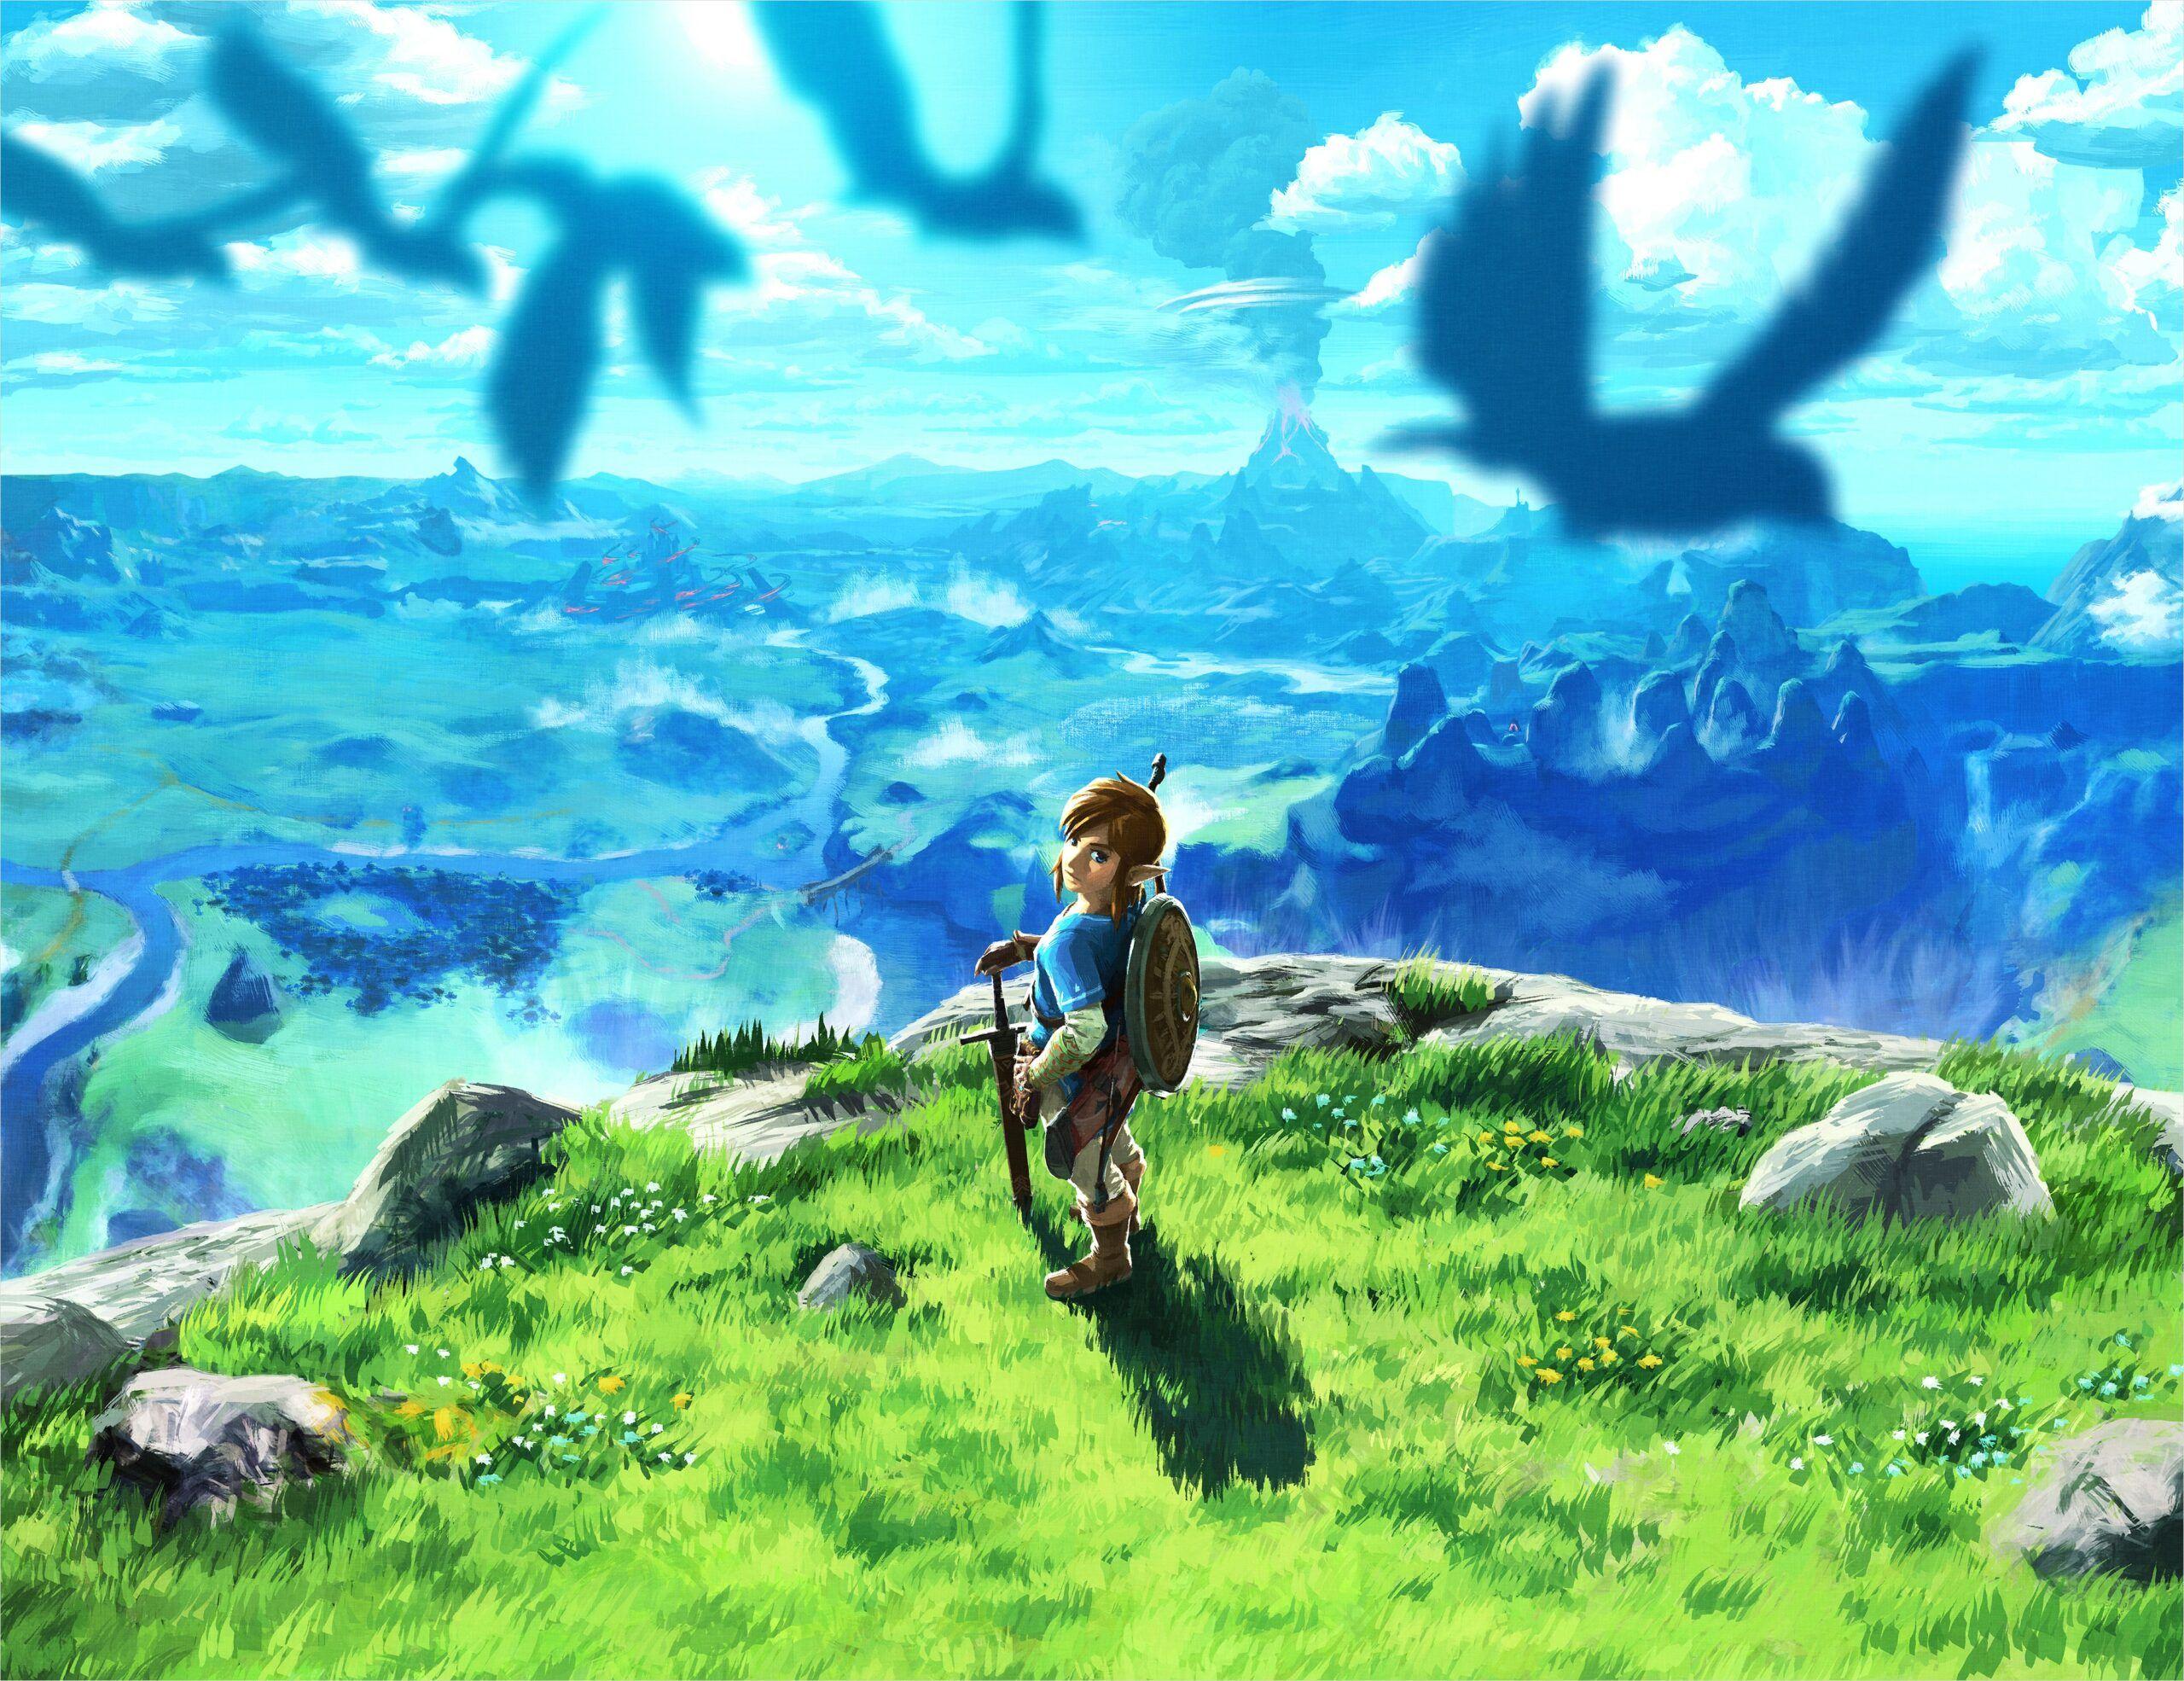 4k Wallpaper Breath Of The Wild In 2020 Zelda Breath Of Wild Legend Of Zelda Breath Breath Of The Wild